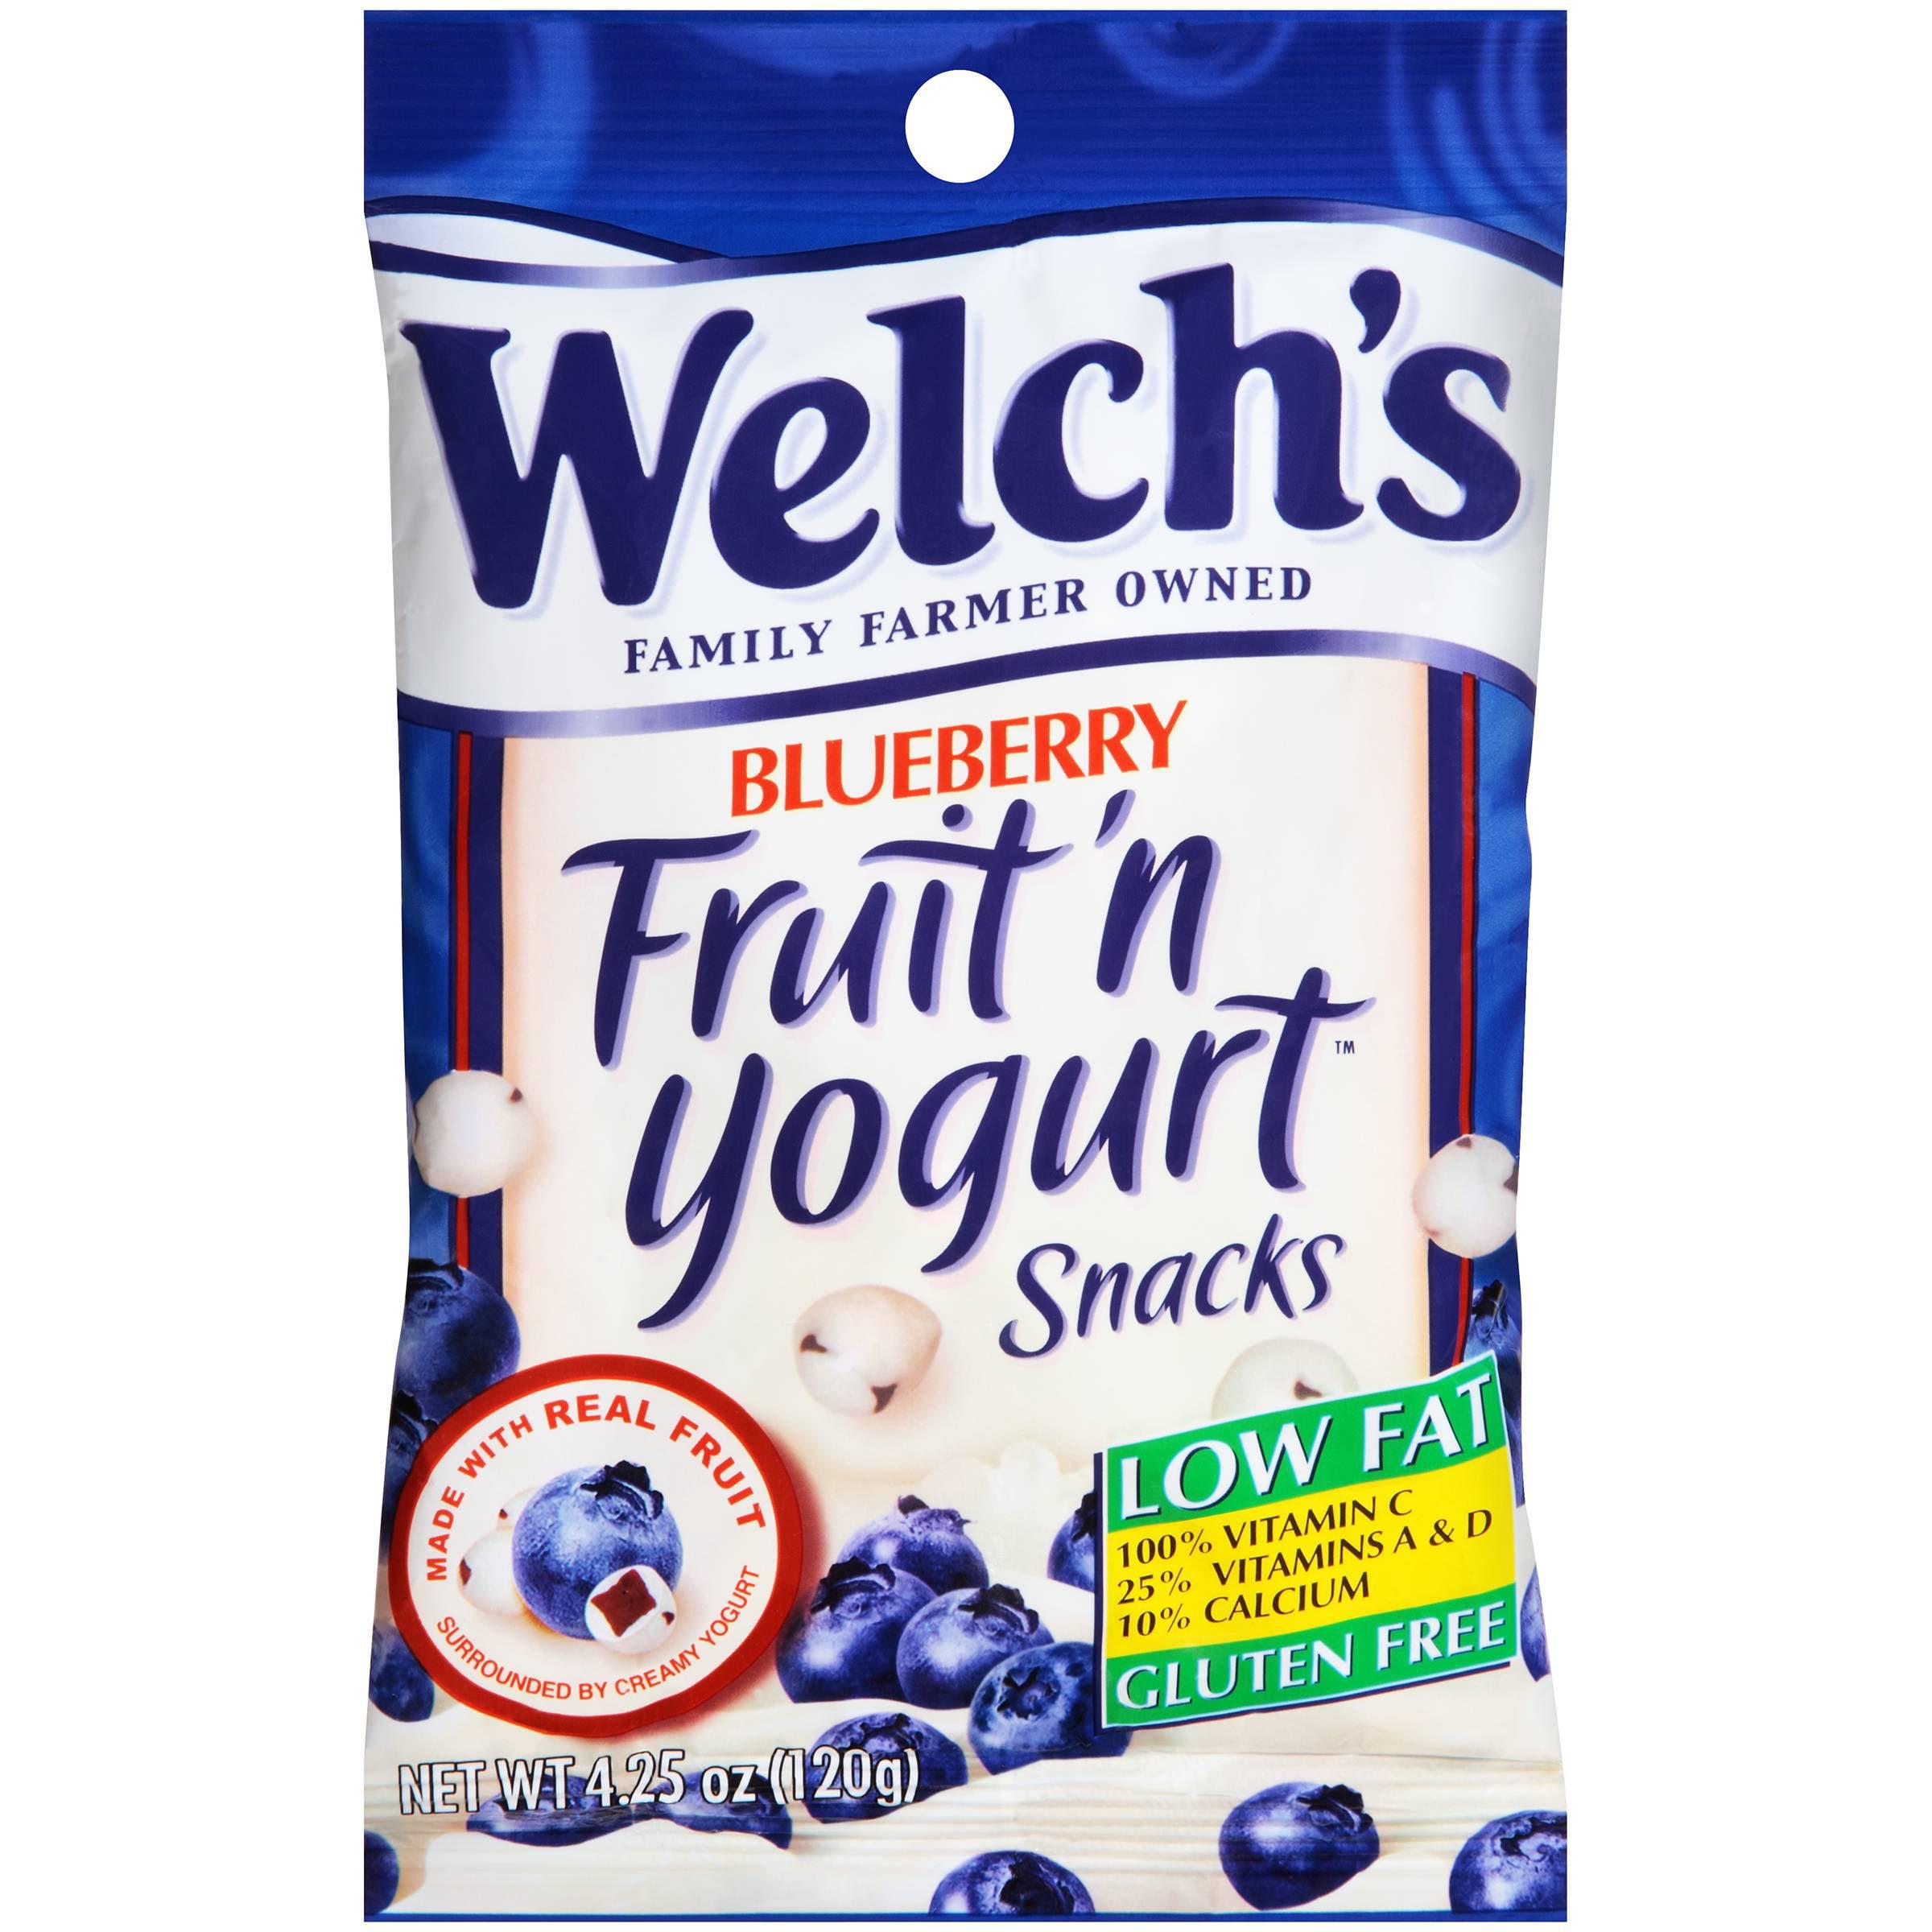 Welch's Fruit'n Yogurt Snacks Blueberry 4.25oz (PACK OF 12)